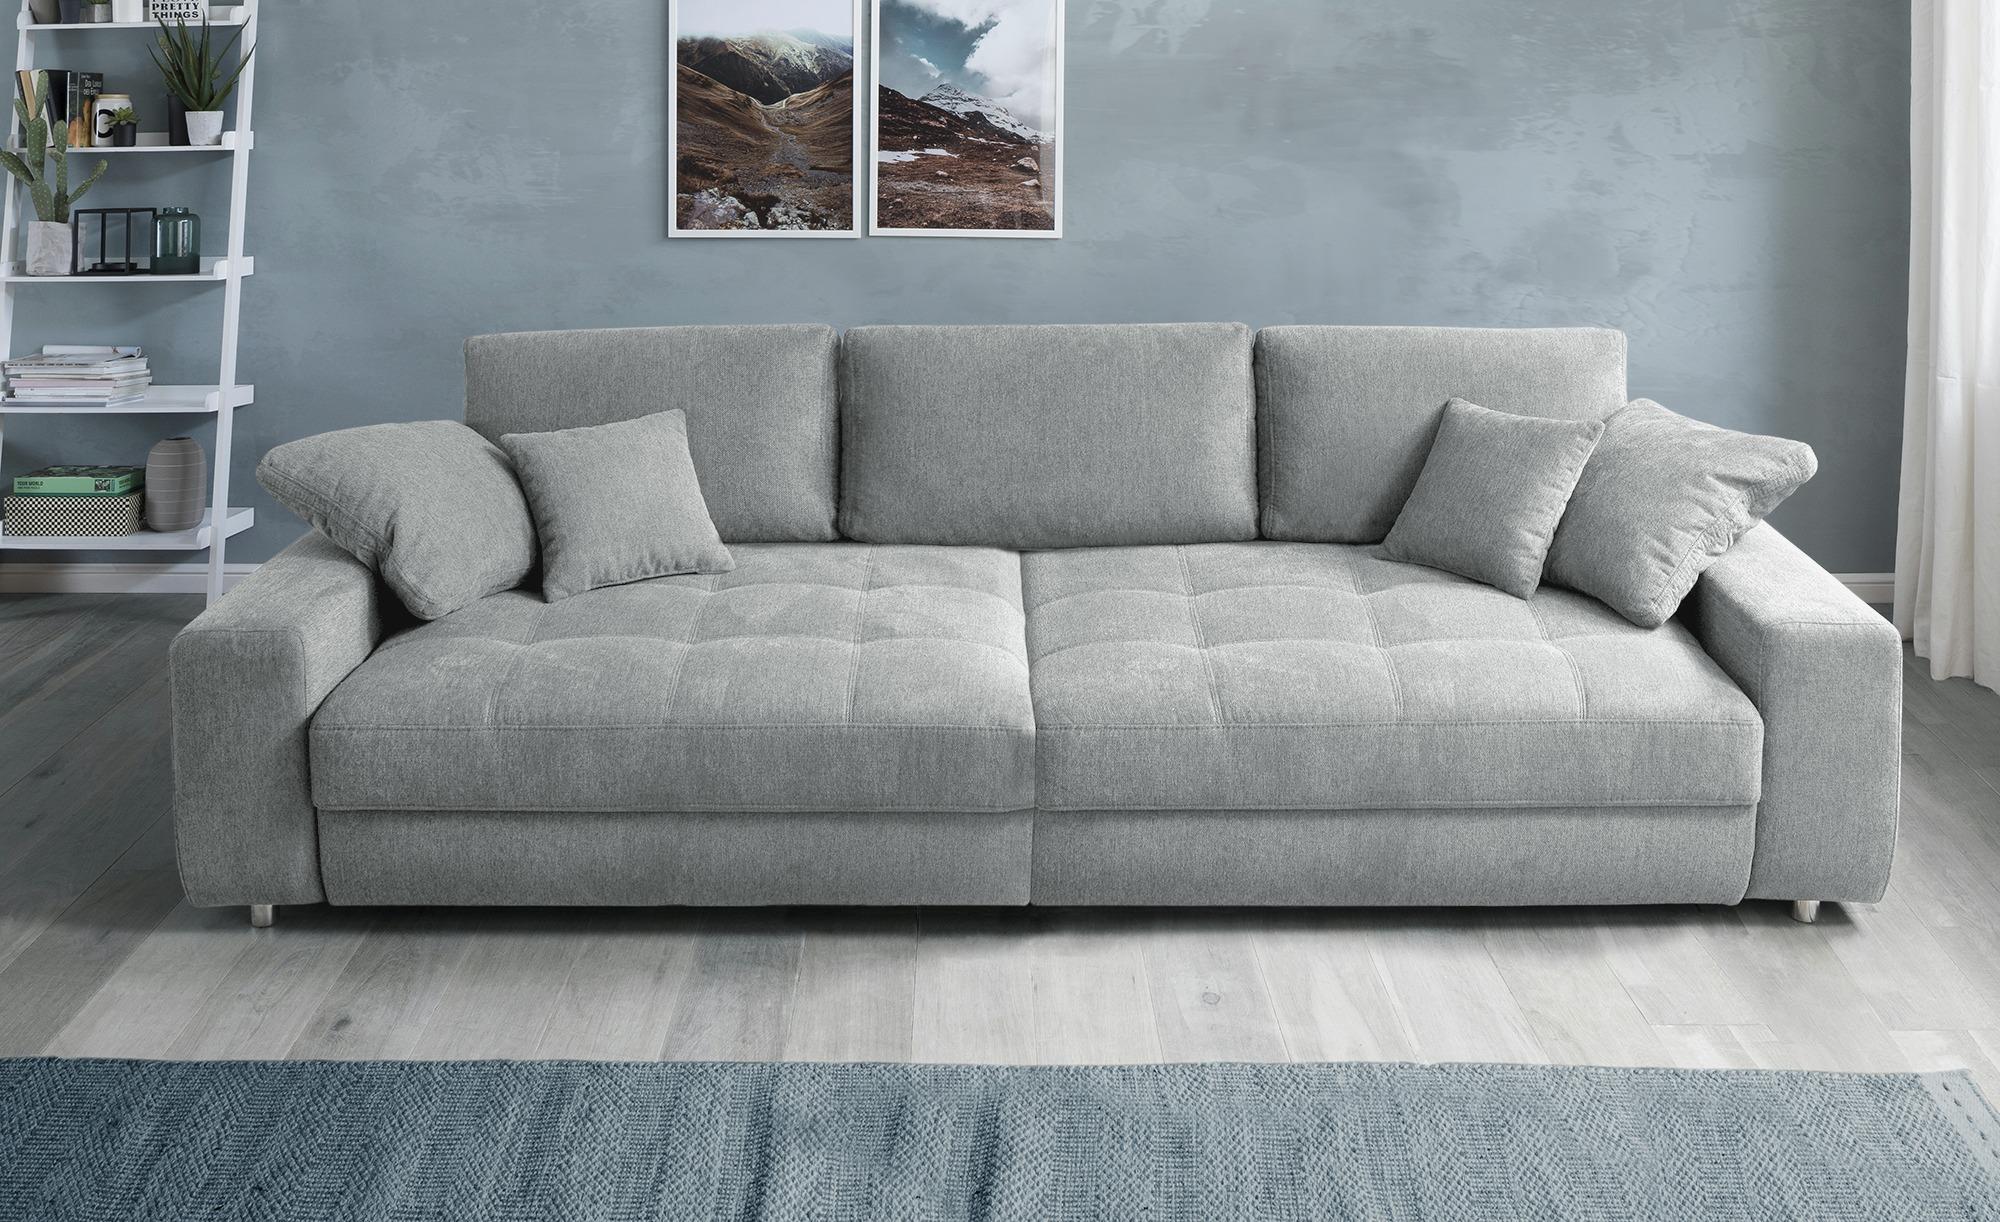 bobb Big Sofa  Arissa de Luxe ¦ grau ¦ Maße (cm): B: 292 H: 84 T: 120 Polstermöbel > Sofas > Big-Sofas - Höffner